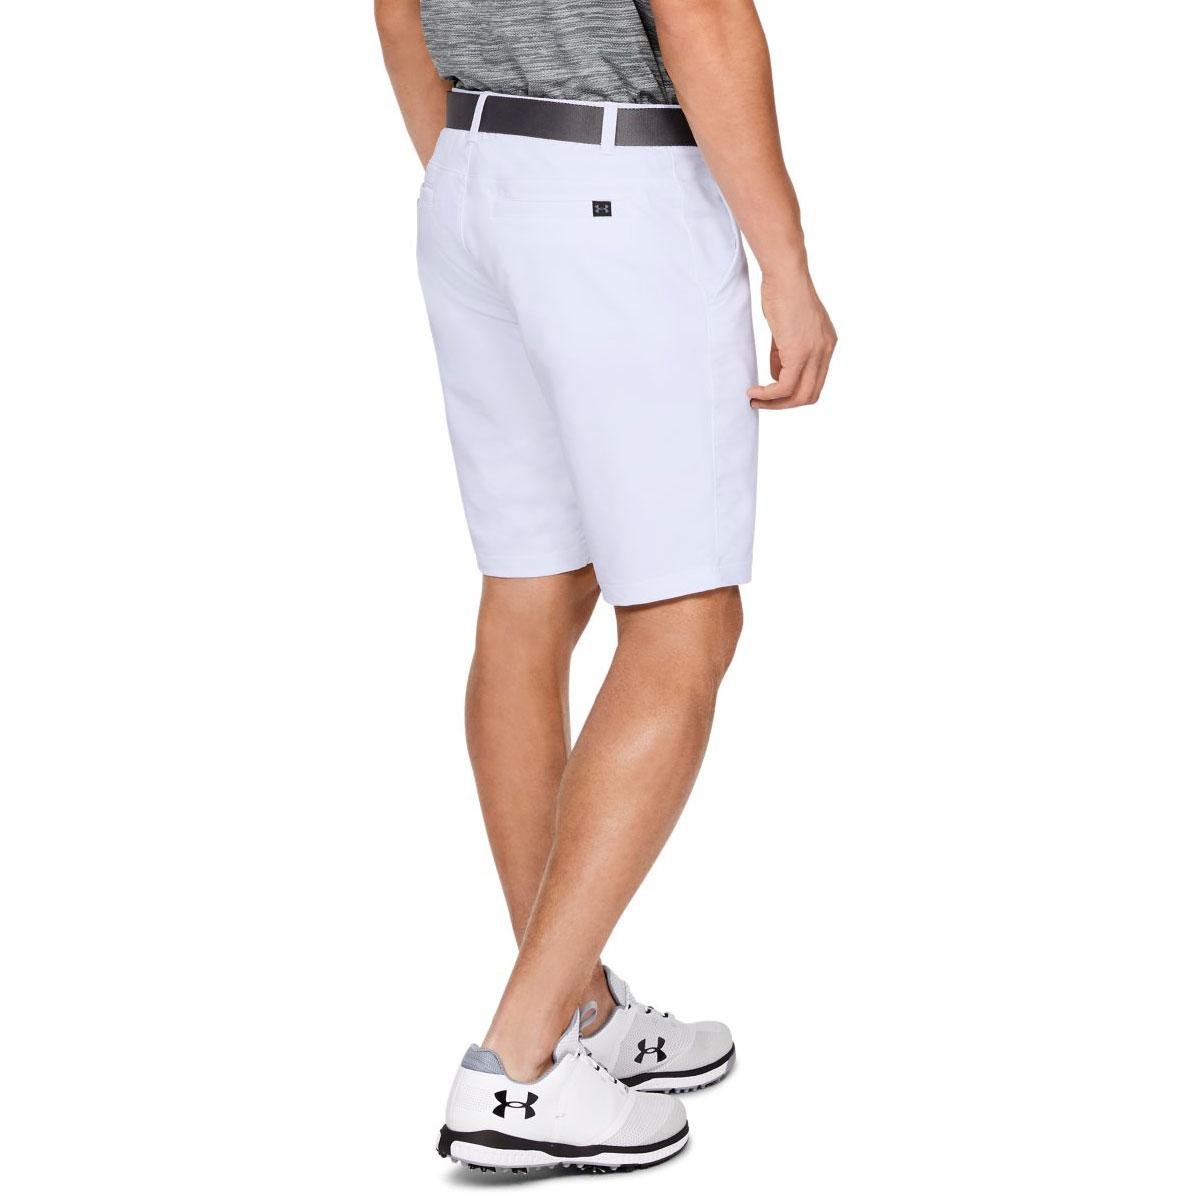 Under-Armour-Mens-2019-EU-Performance-Taper-Stretch-Soft-Comfort-Golf-Shorts thumbnail 15